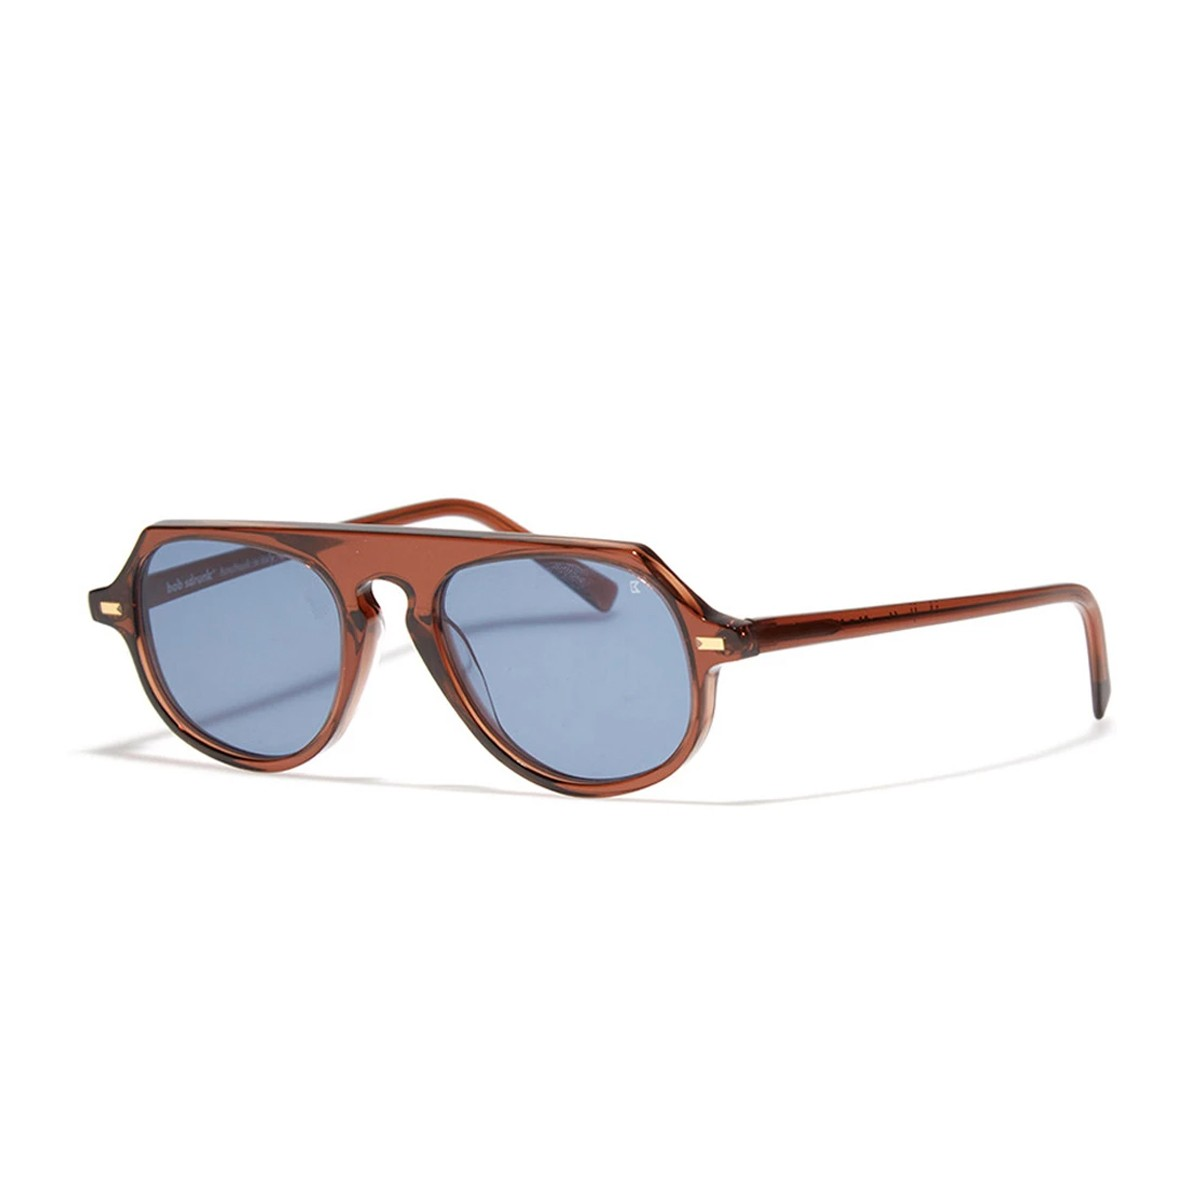 Bob Sdrunk Richard/S   Unisex sunglasses